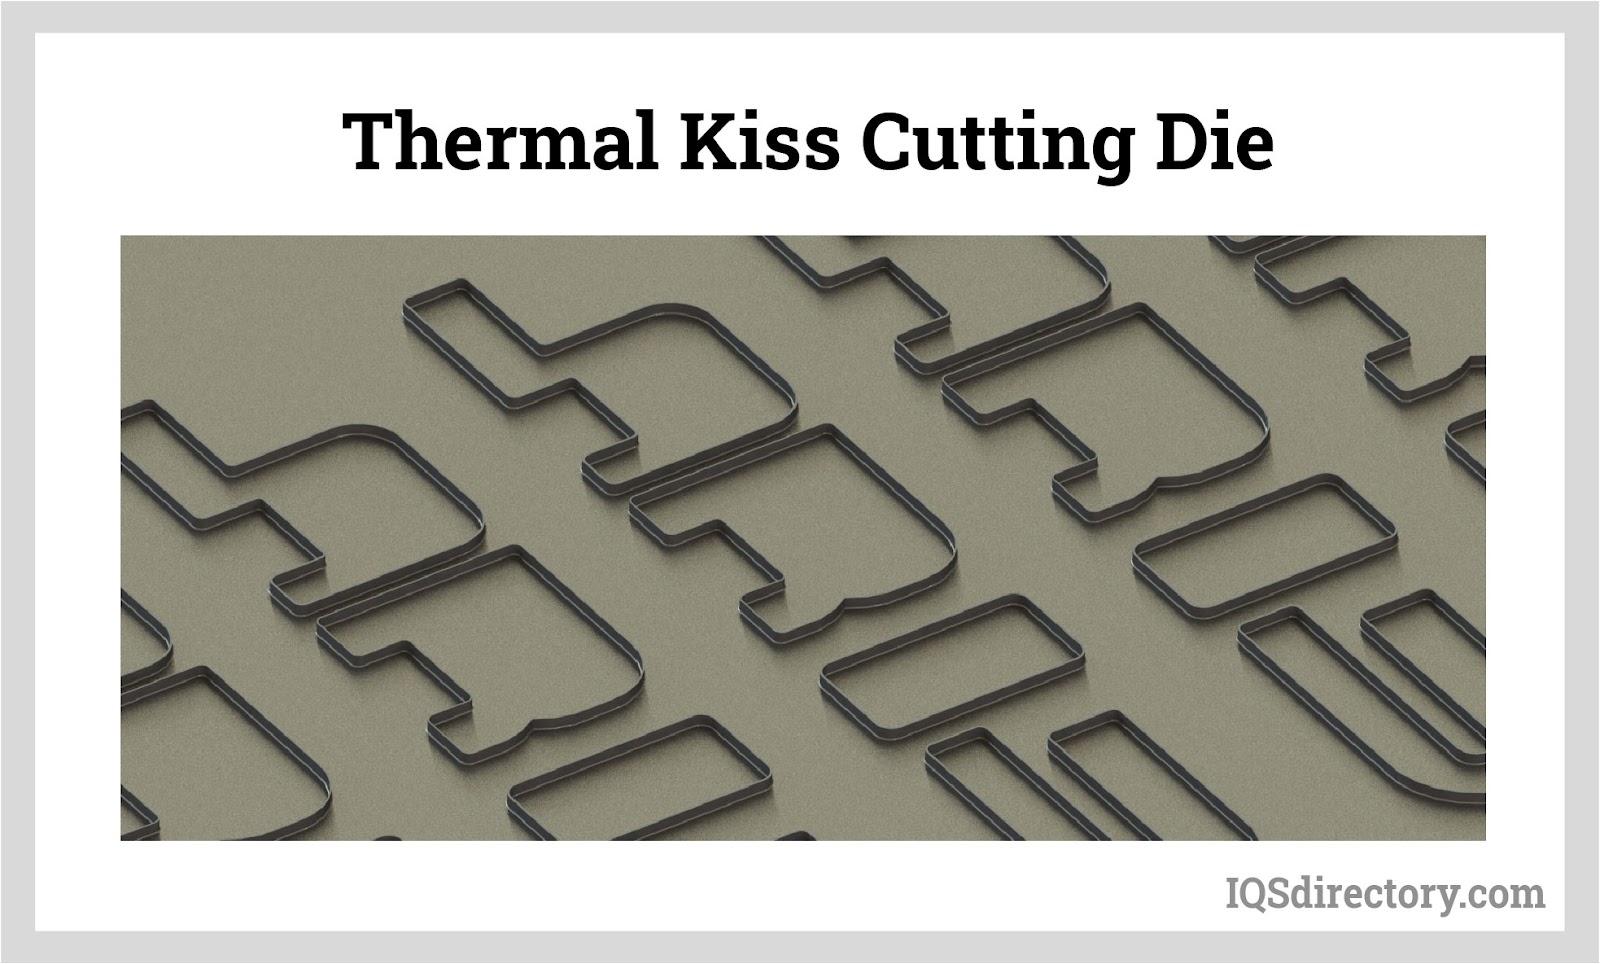 Thermal Kiss Cutting Die